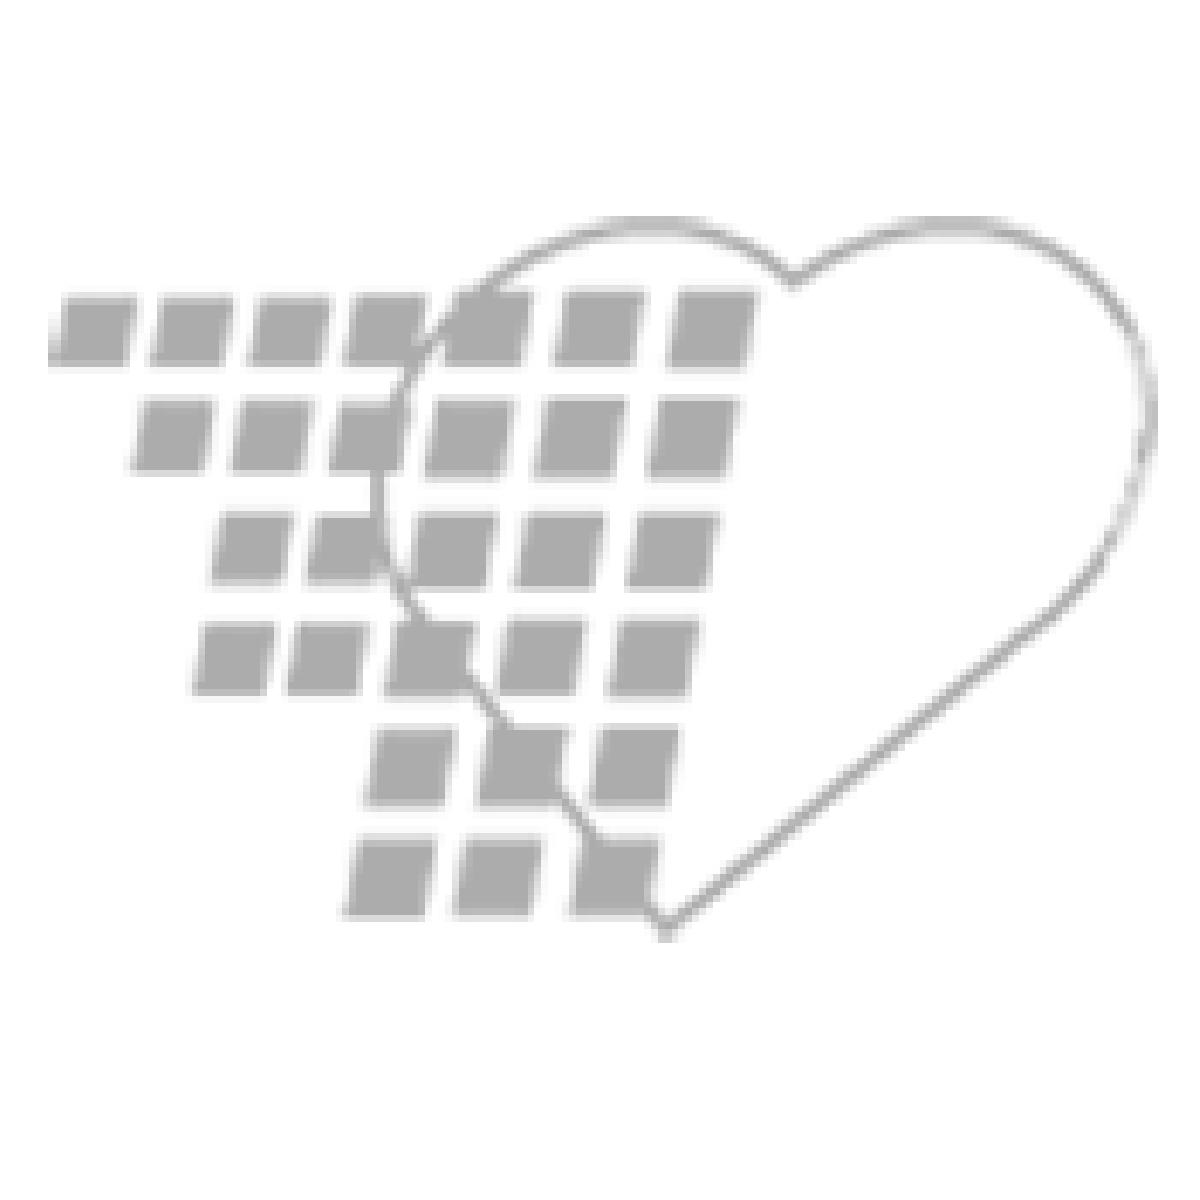 06-93-9022 - Demo Dose® Intropn (DOPamin) 10 mL vial 40mg/mL